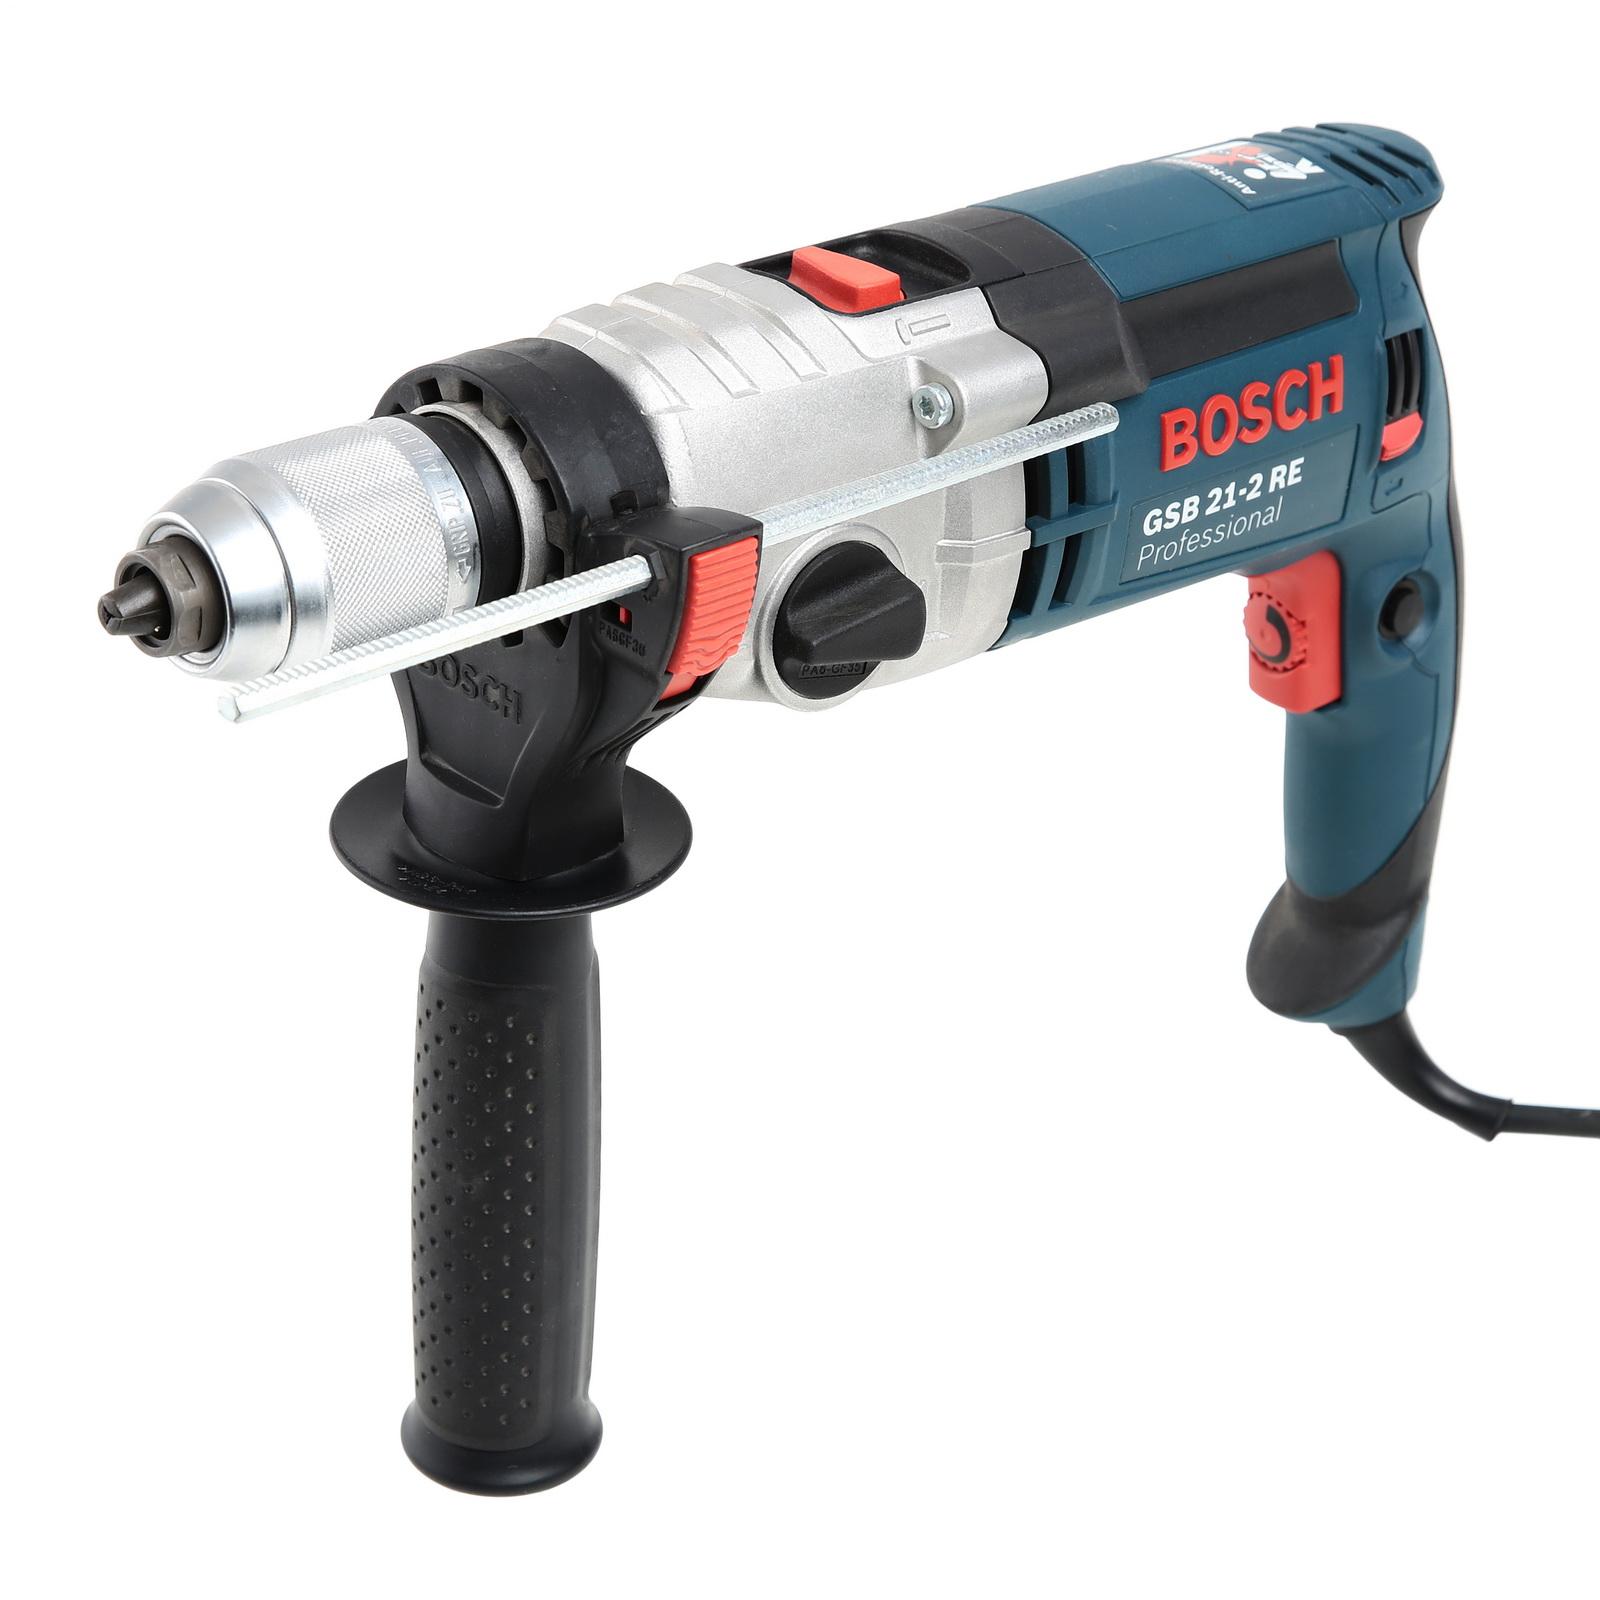 Дрель ударная Bosch Gsb 21-2 re (0.601.19c.500) дрель bosch gsb 192 re 0 601 17в 500